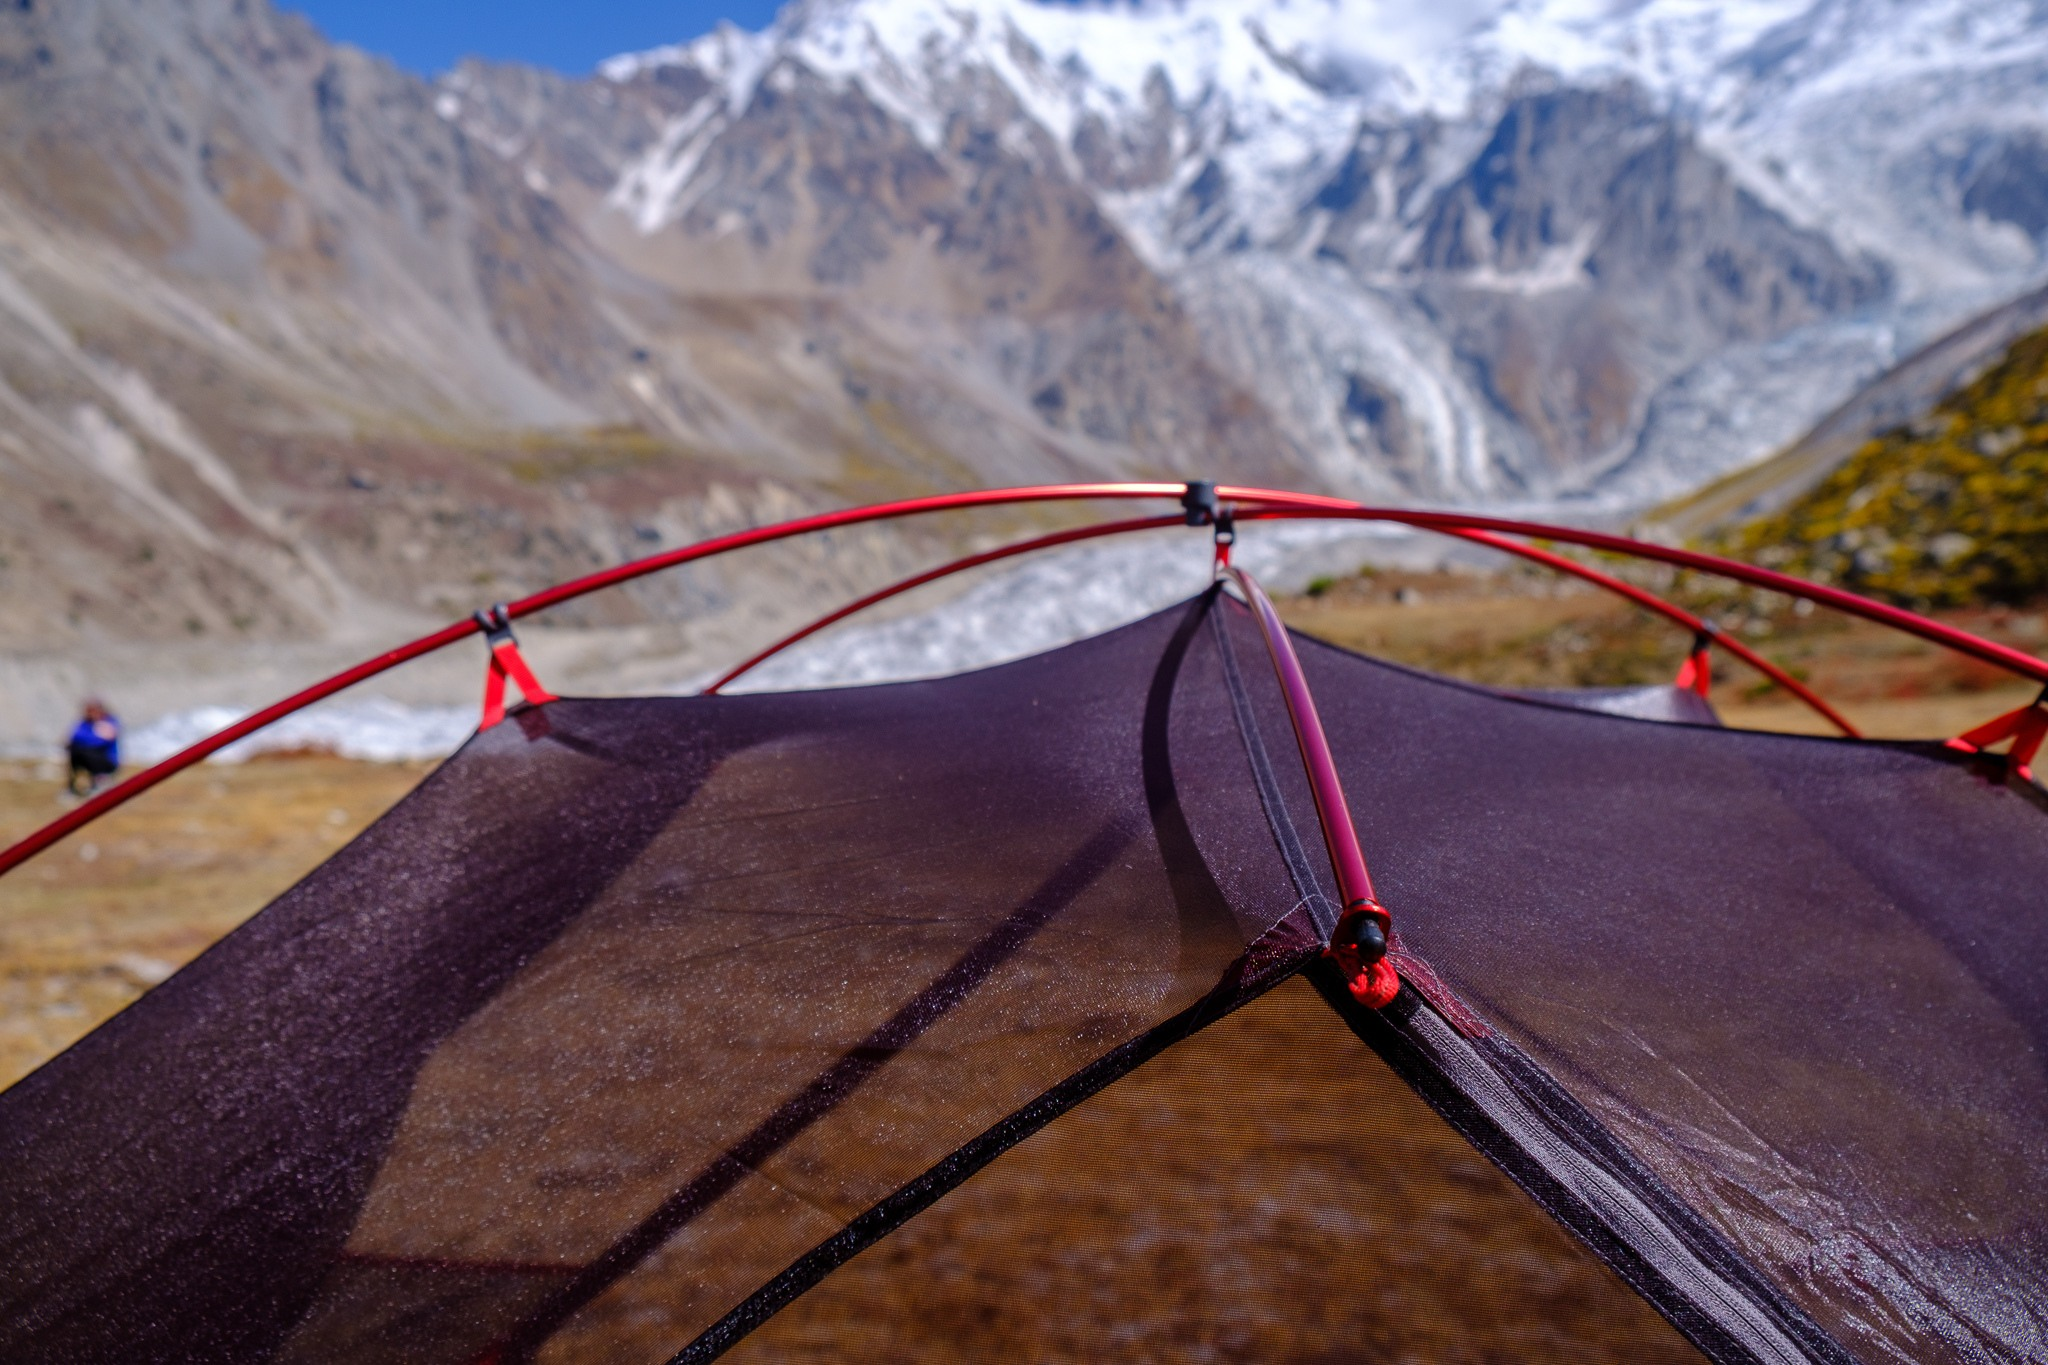 Msr backpacking Tent